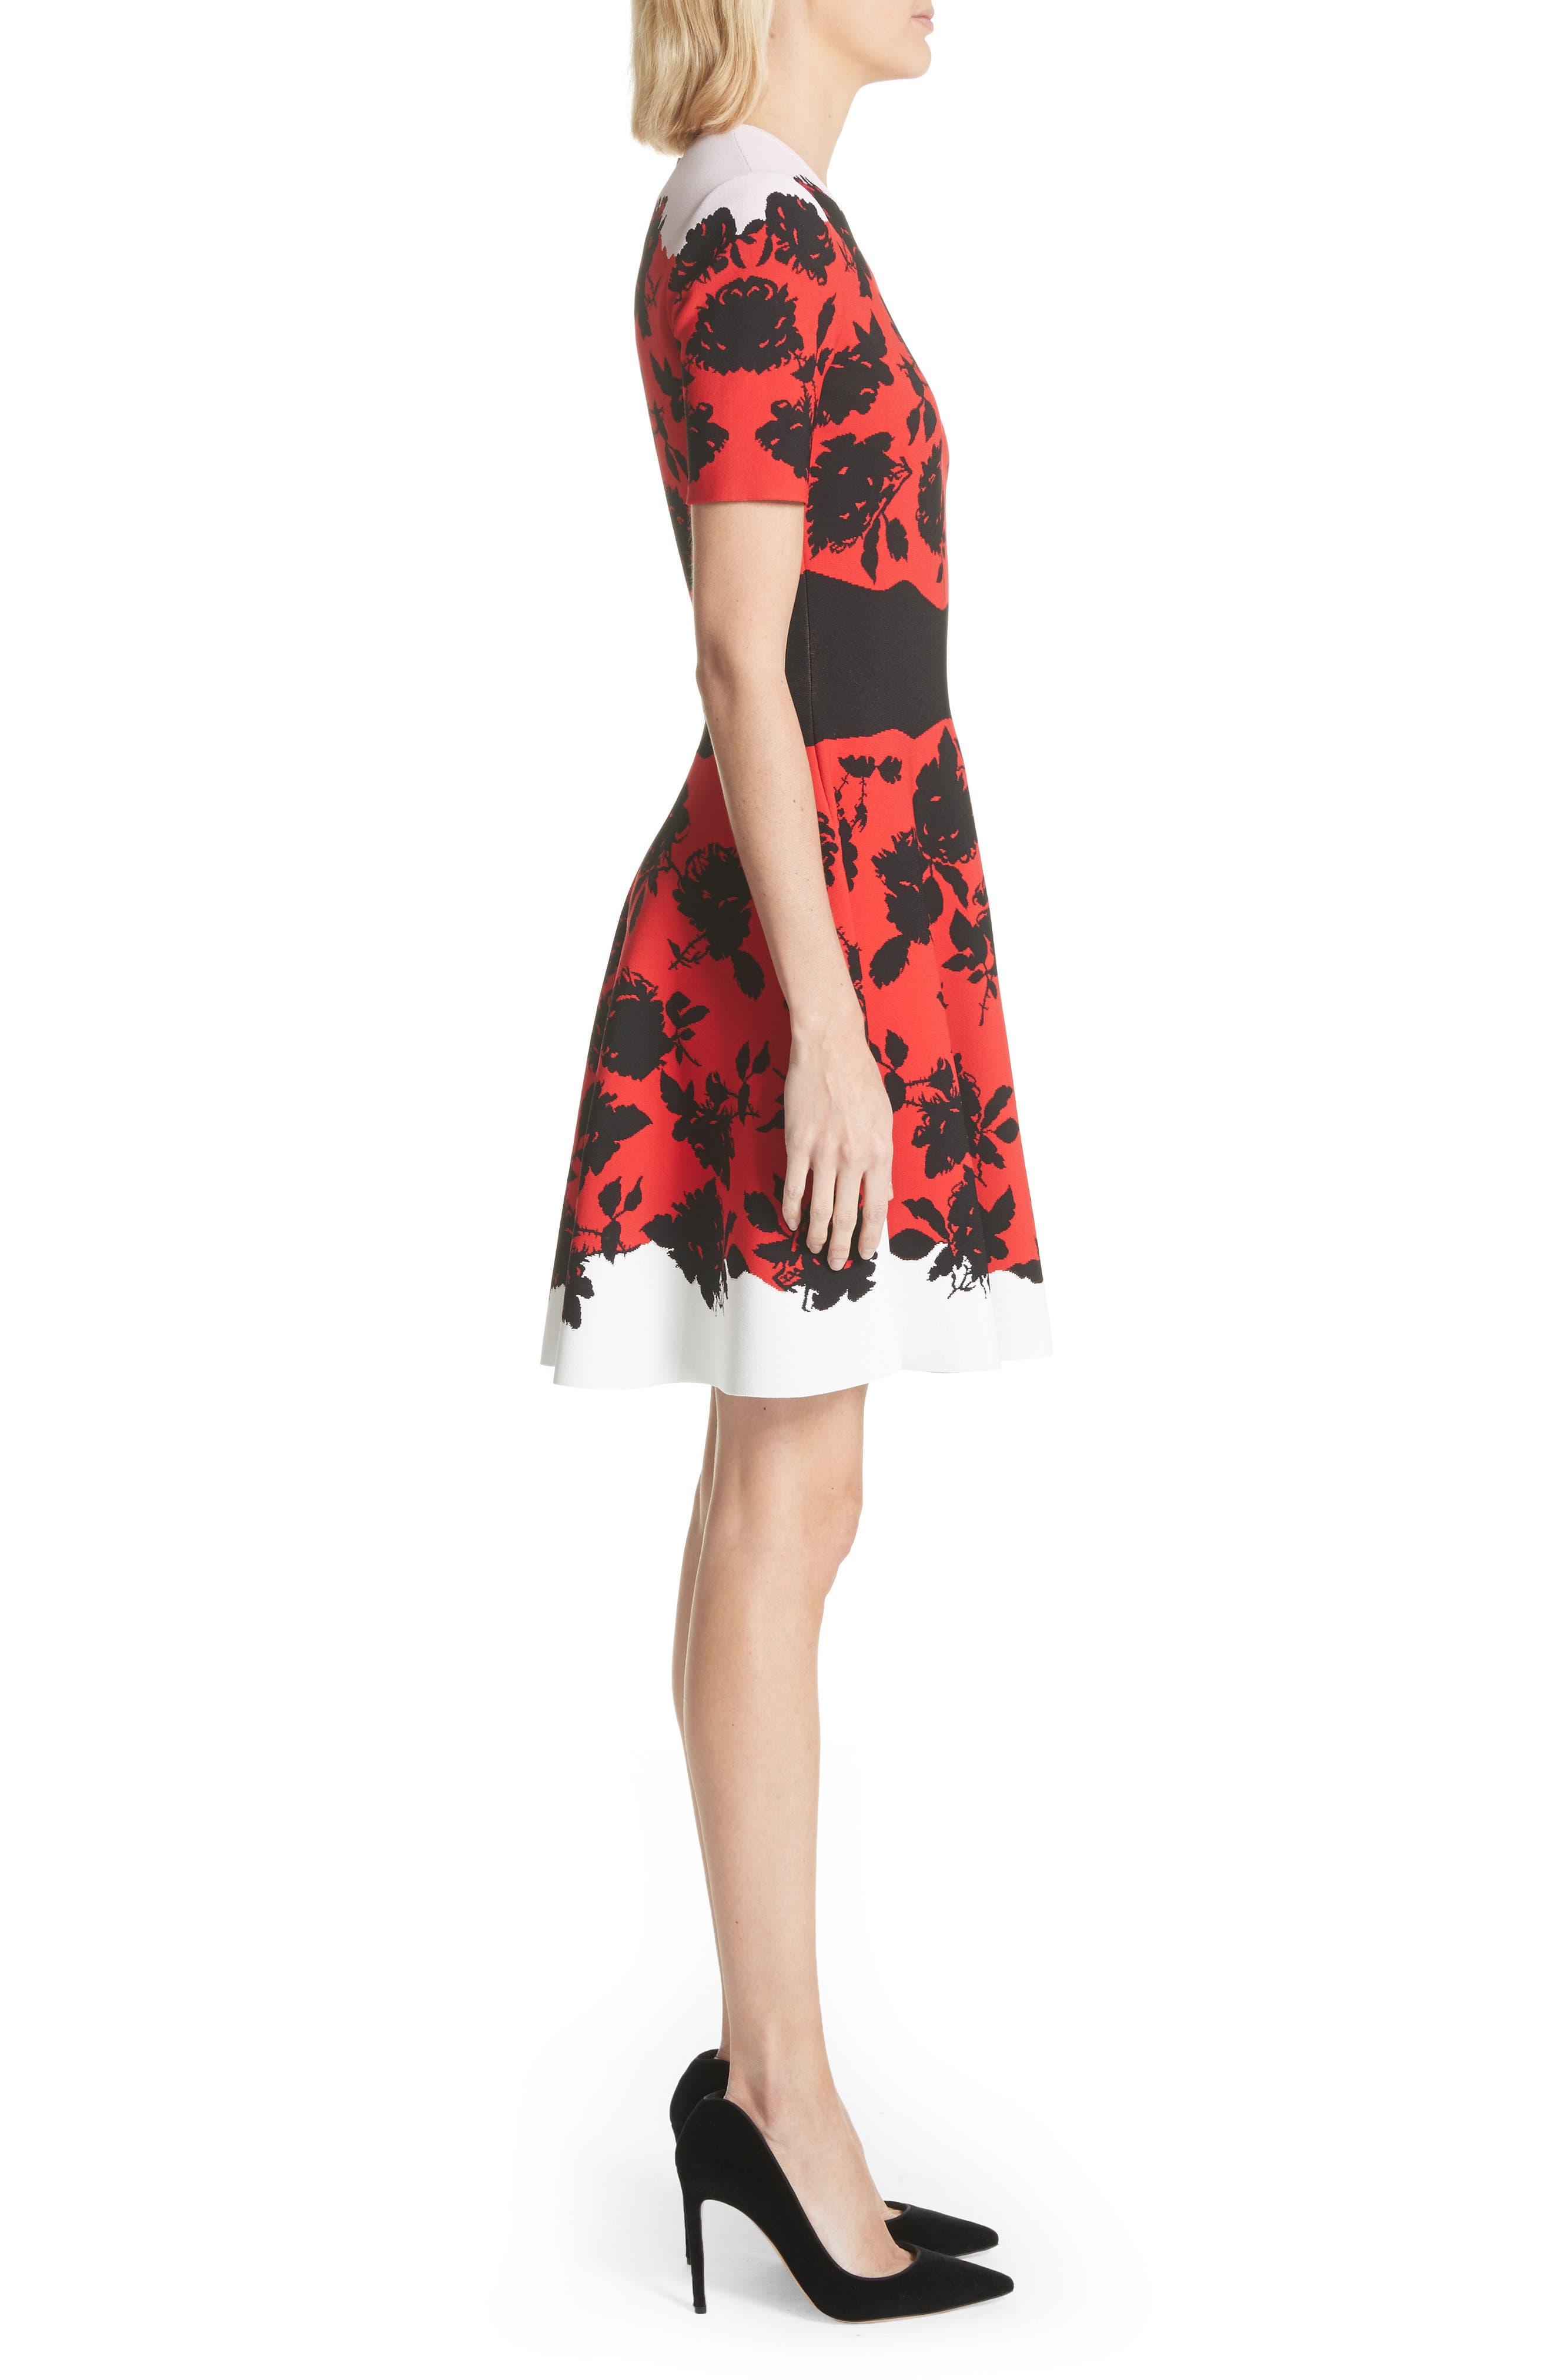 Rose Jacquard Knit Flounce Dress,                             Alternate thumbnail 3, color,                             Red/ Black/ Ivory/ Pink